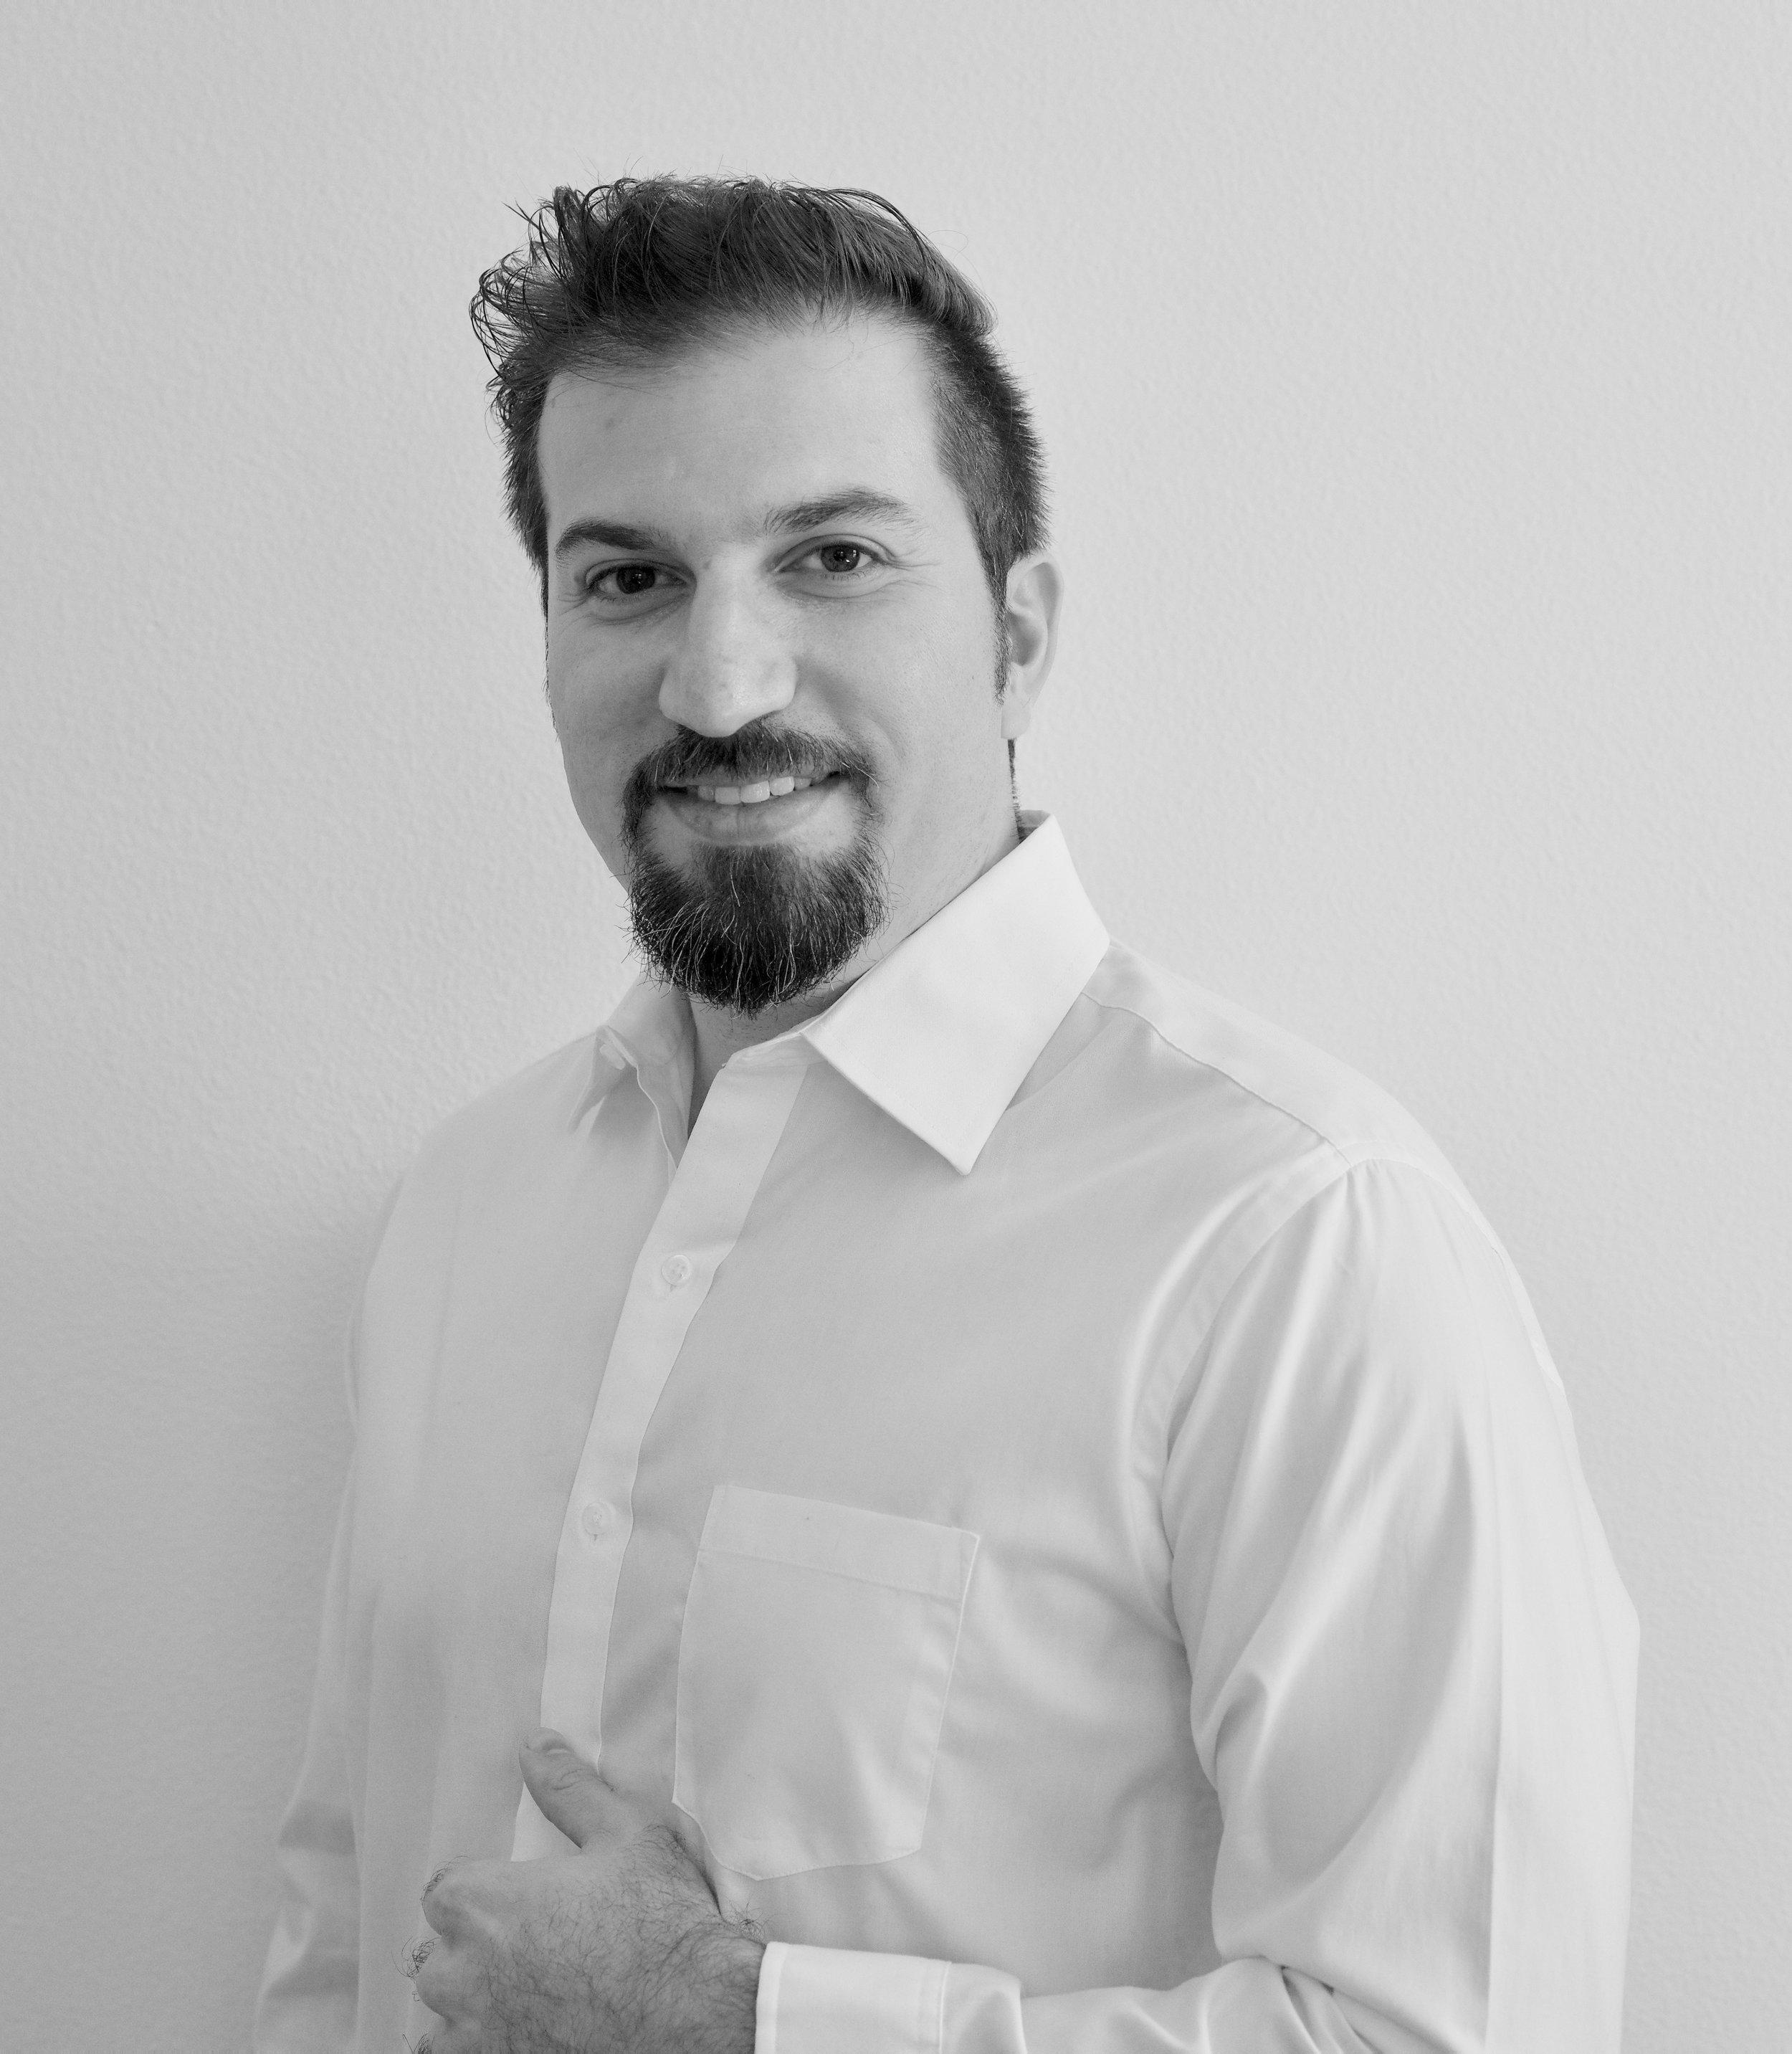 Hossein Tootoonchy |  Linkedin  |  Email  | 949.616.6249